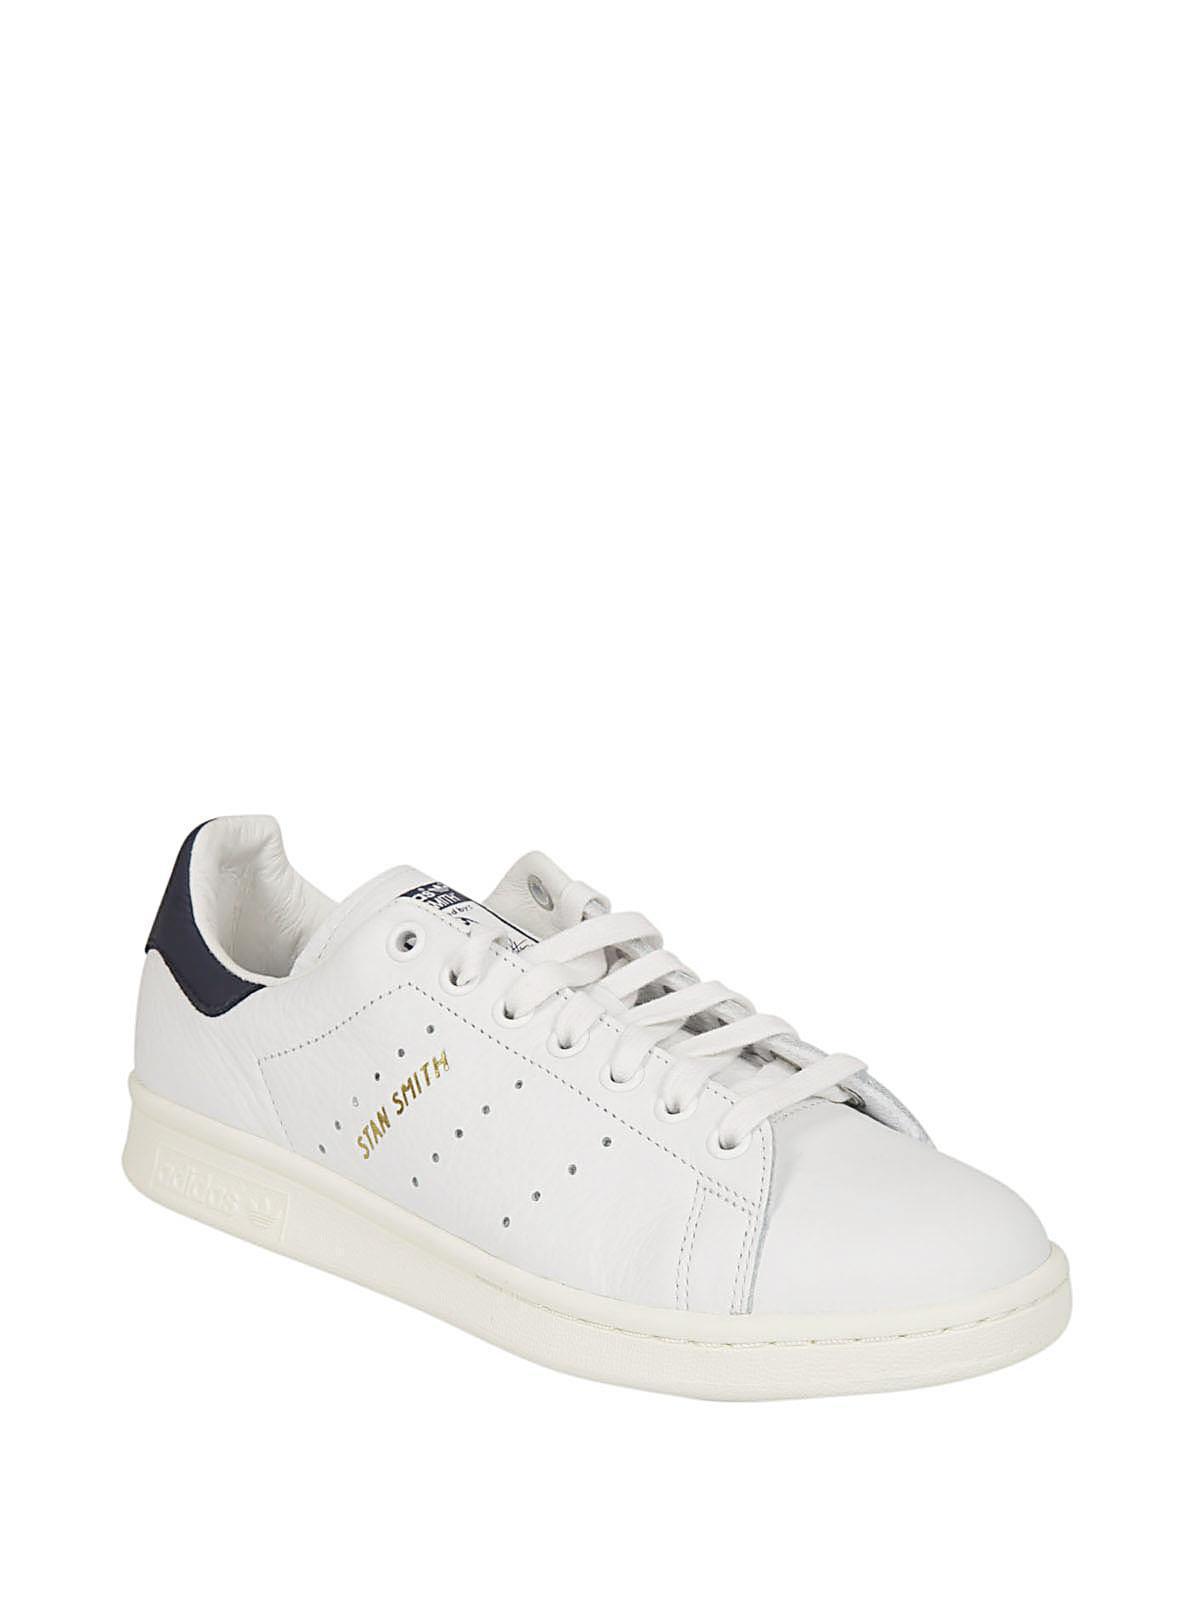 official photos 5d295 fc4ab adidas Originals ADIDAS ORIGINALS Sneaker stan smith bianca in White for  Men - Lyst